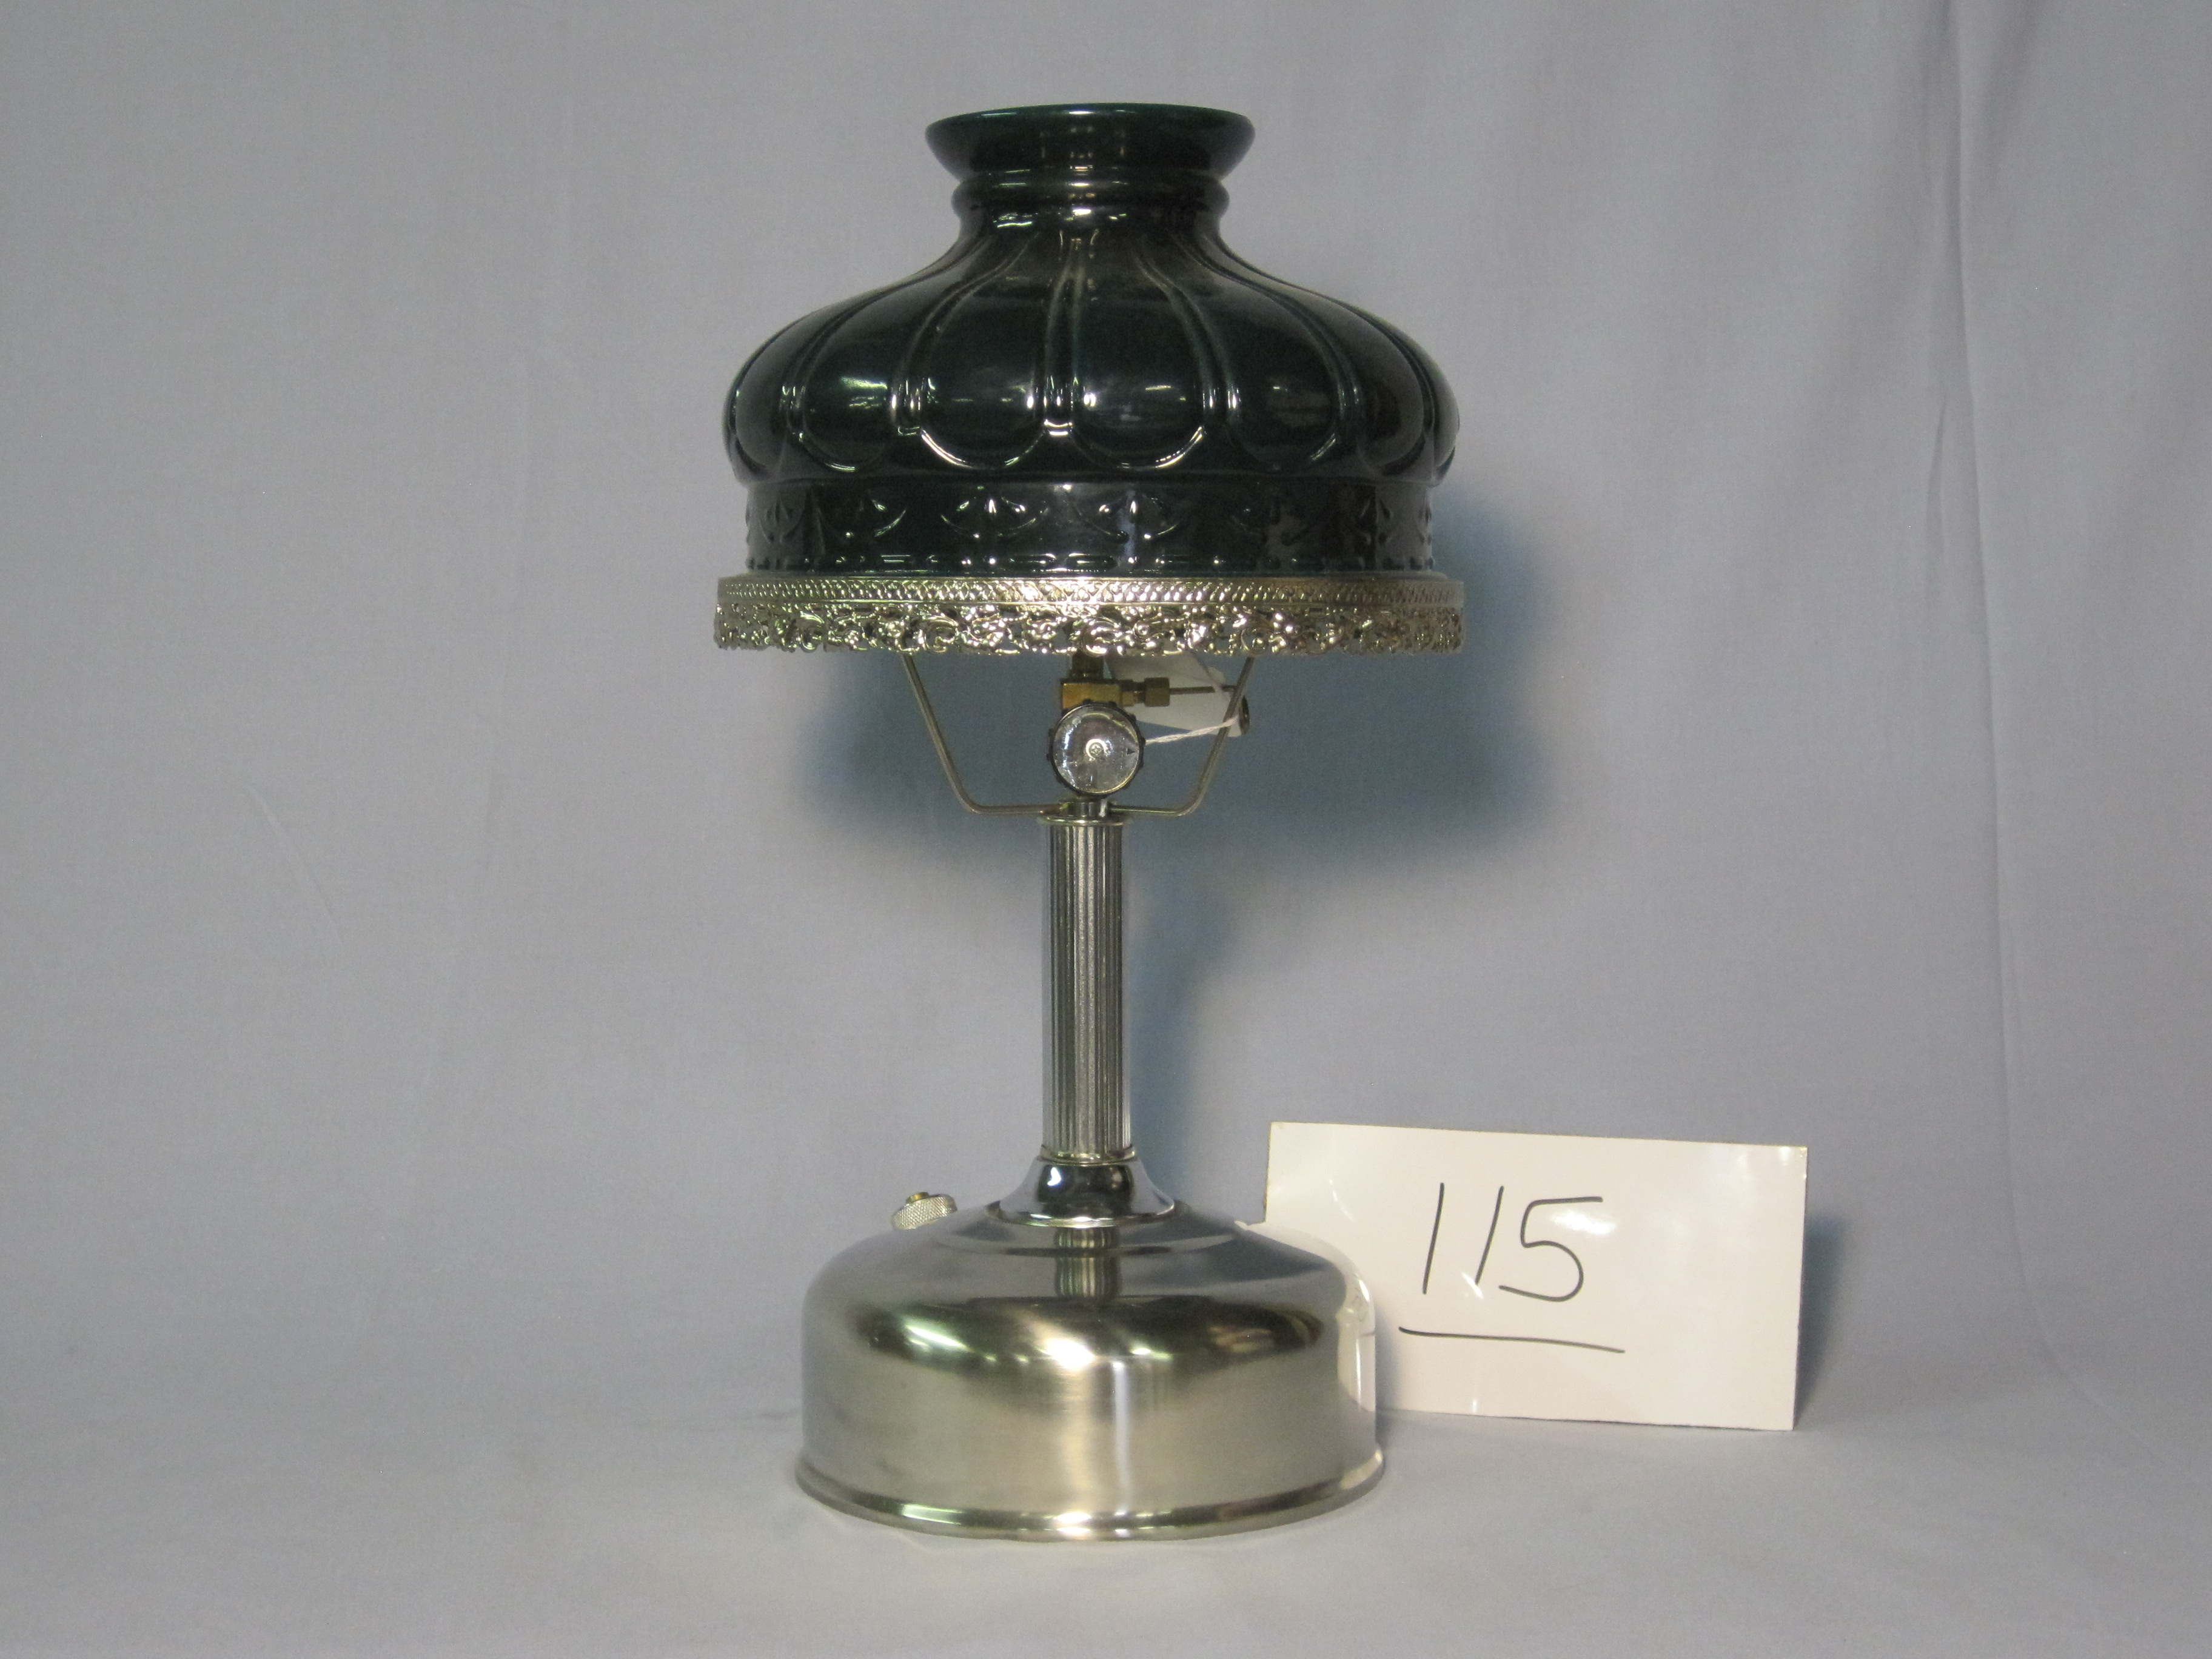 Leacock Coleman(Amish) 107 lamp